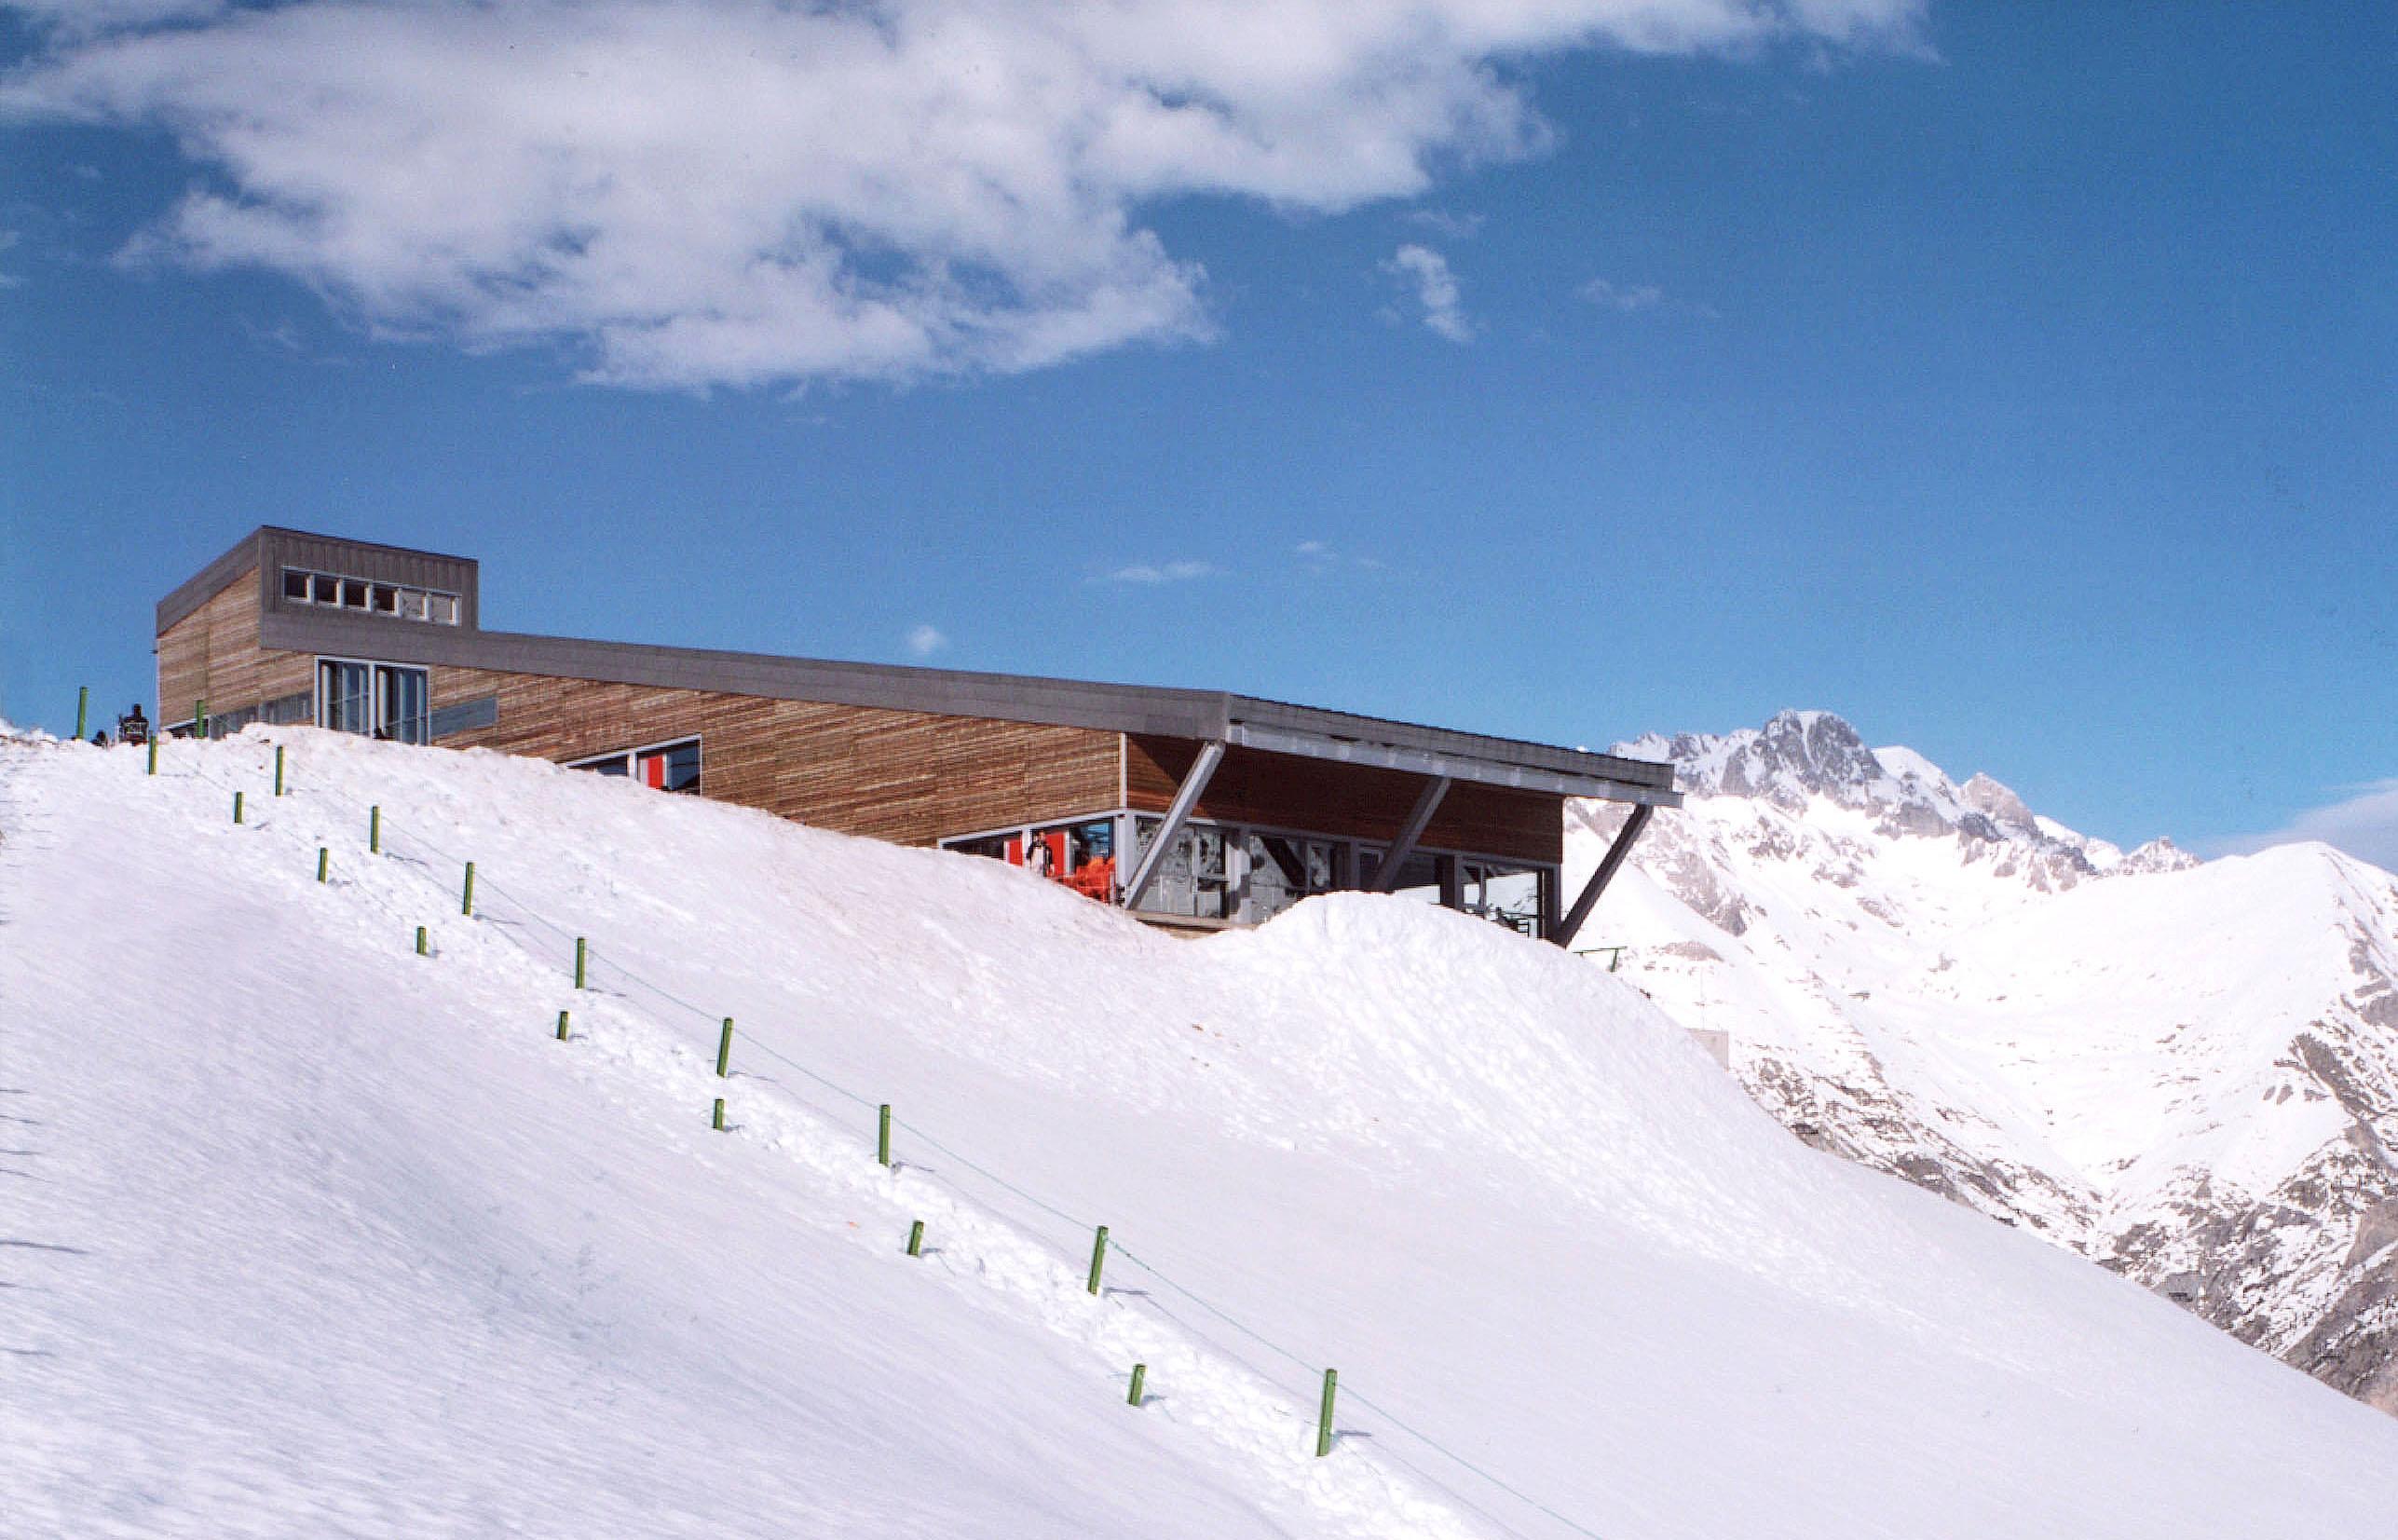 Estacion Esqui Panticosa